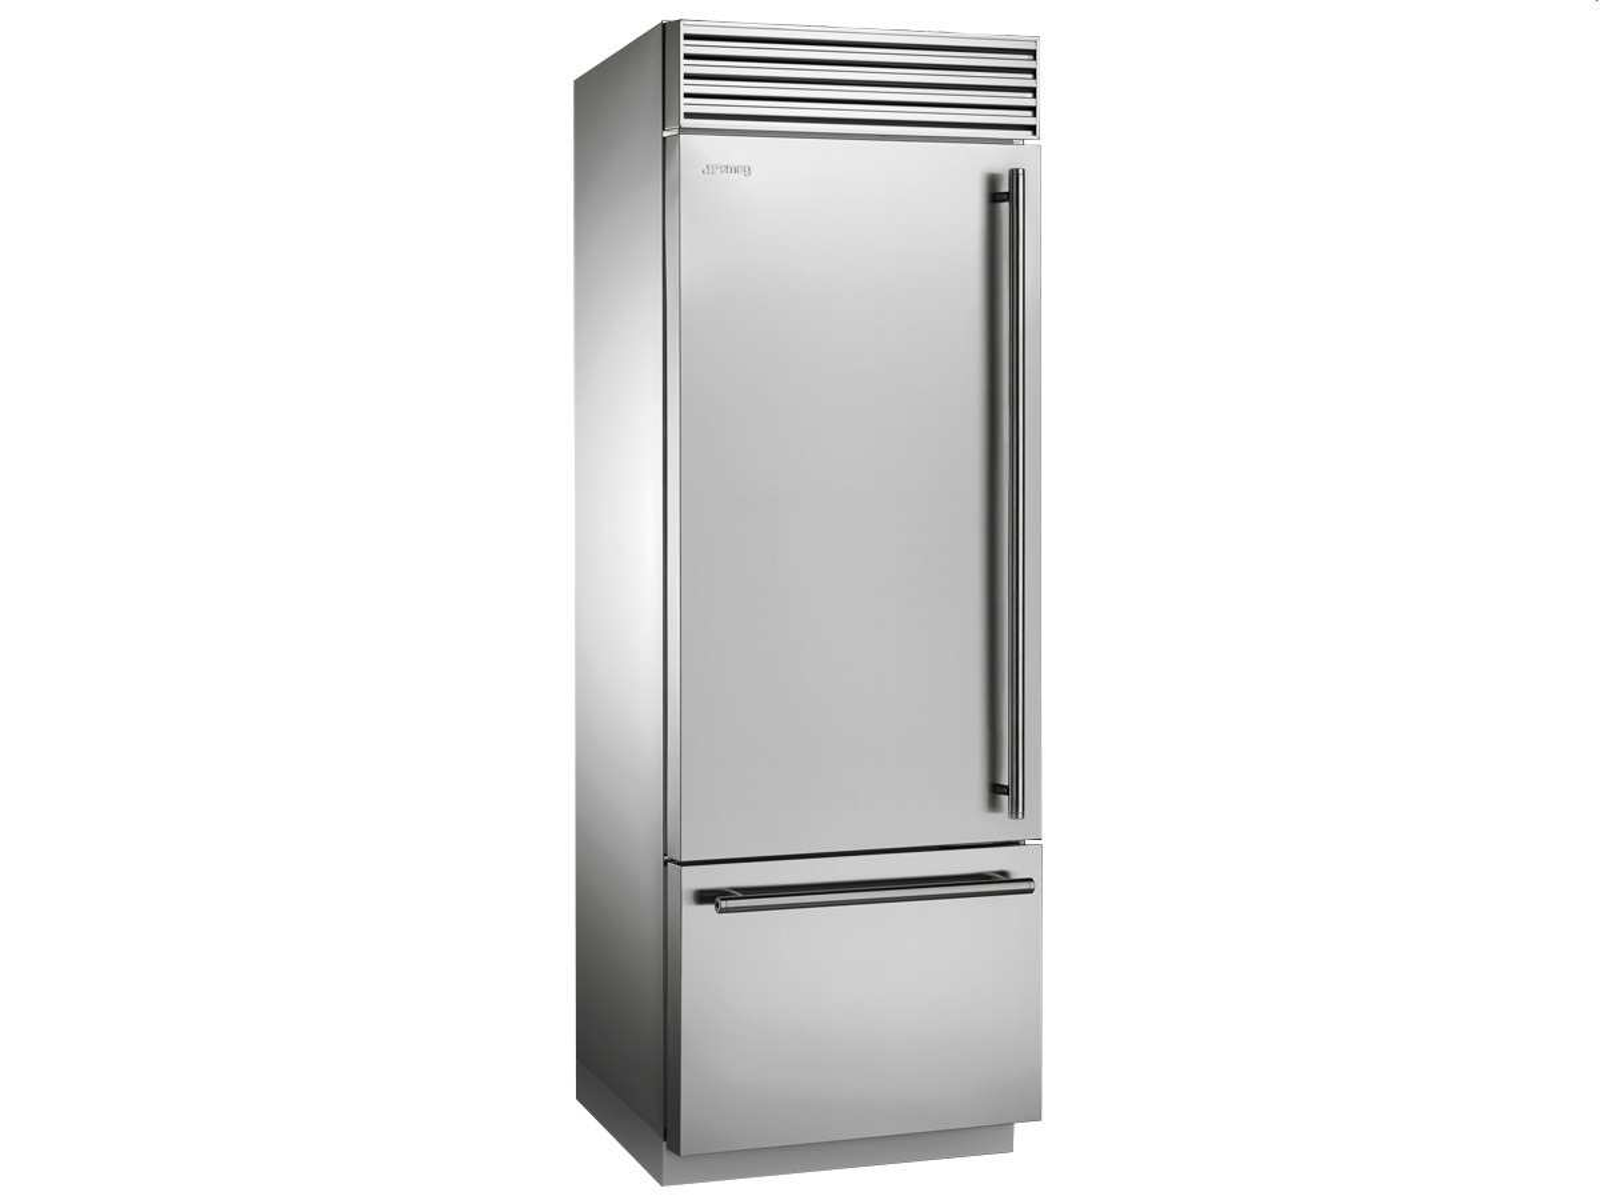 Kühlschrank Kombi : Kühlschrank kombi günstig smeg fab rbln stand kühl gefrier